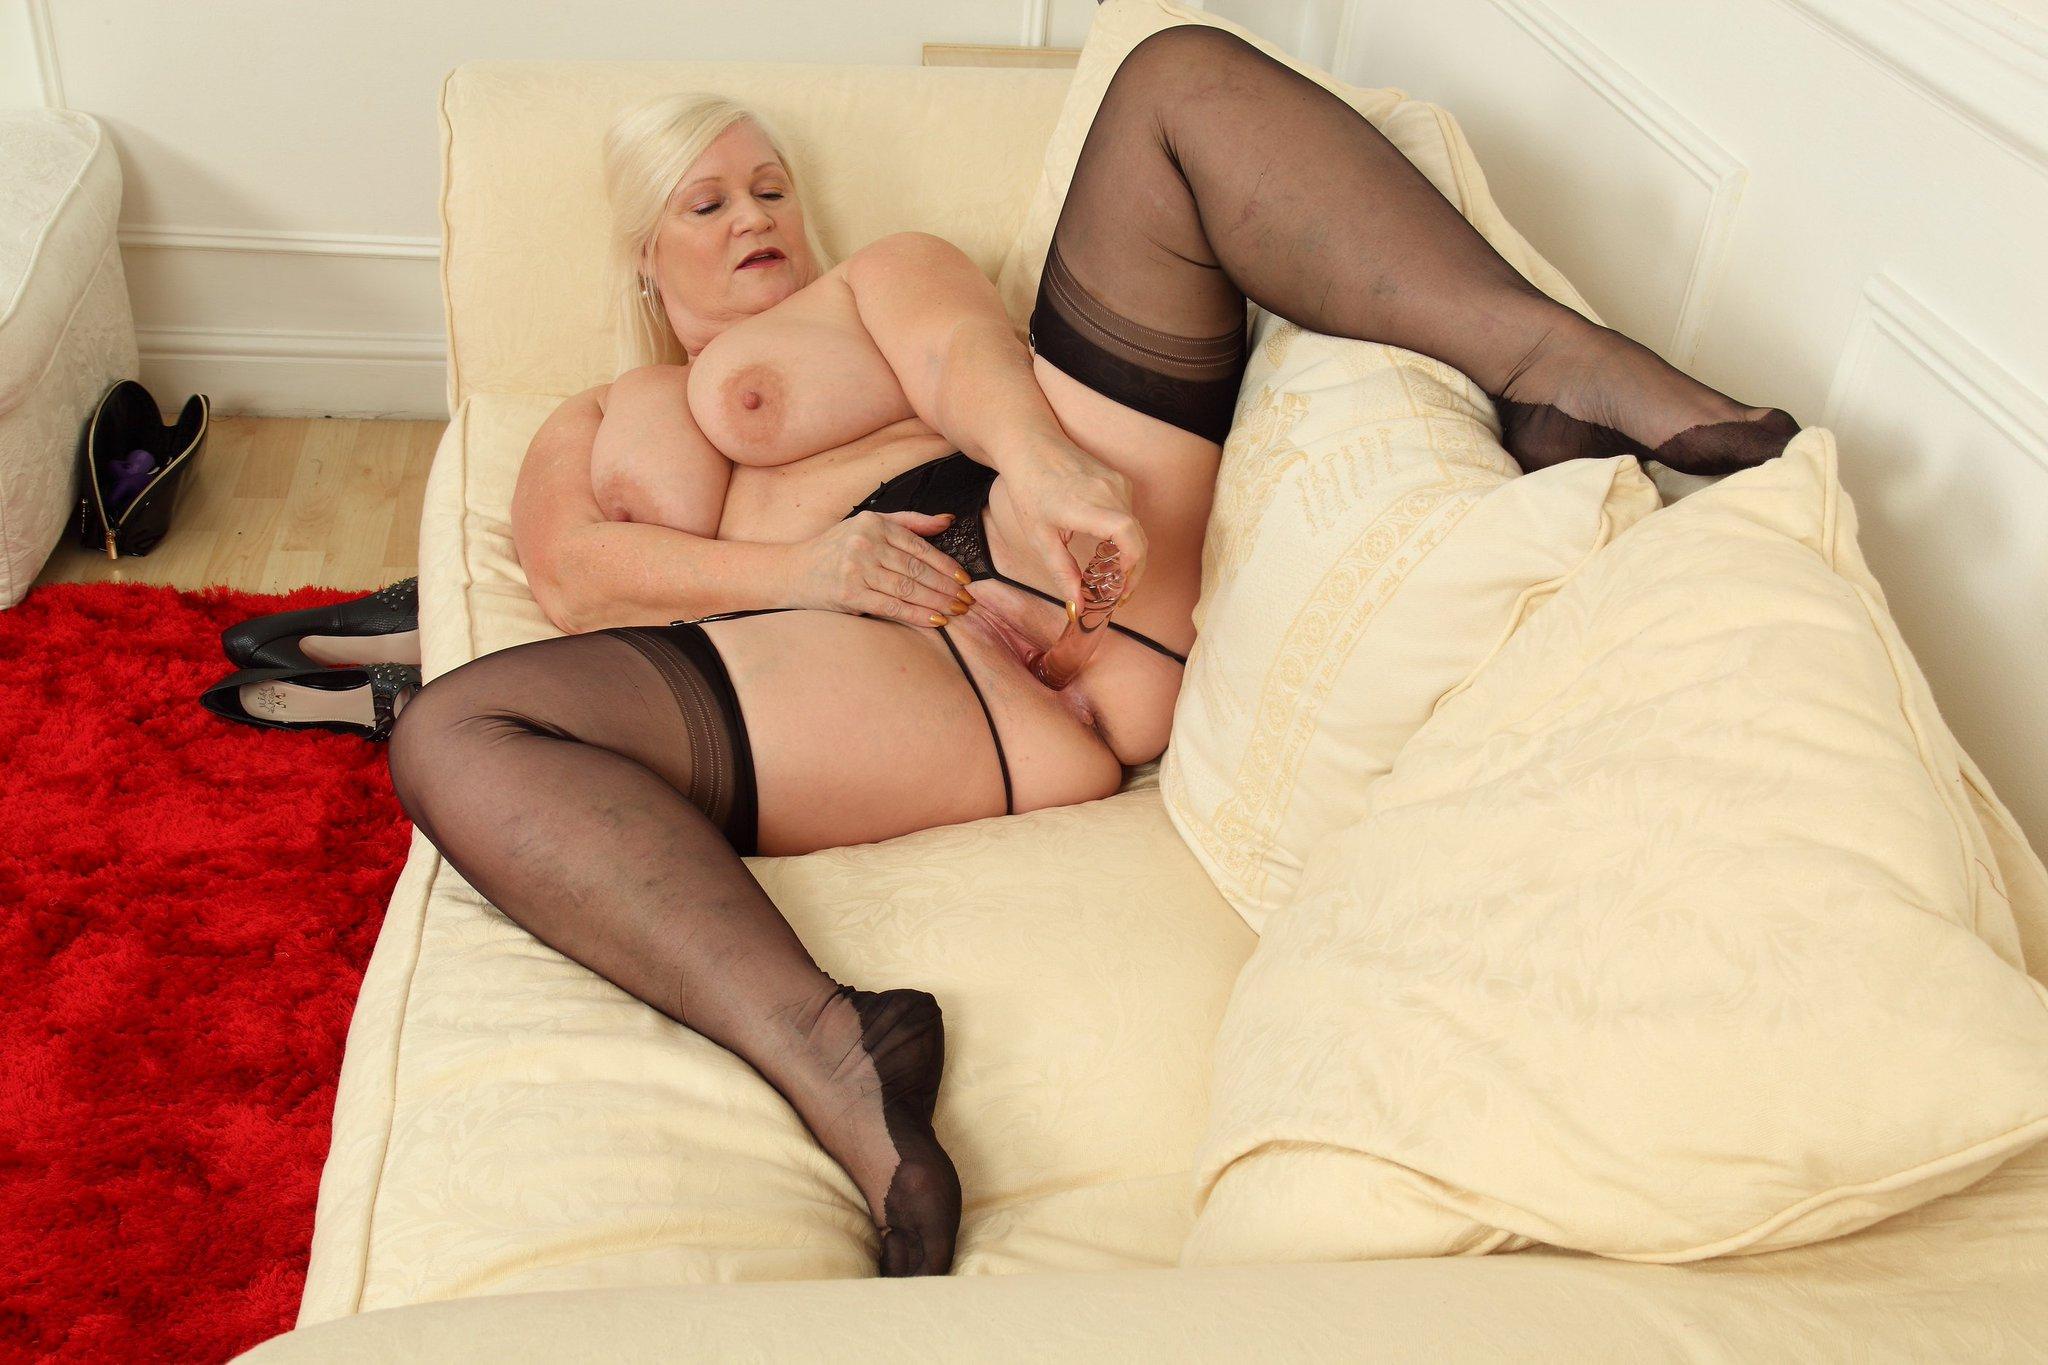 Bbw lacey mature nl, dream hq girl nude mov